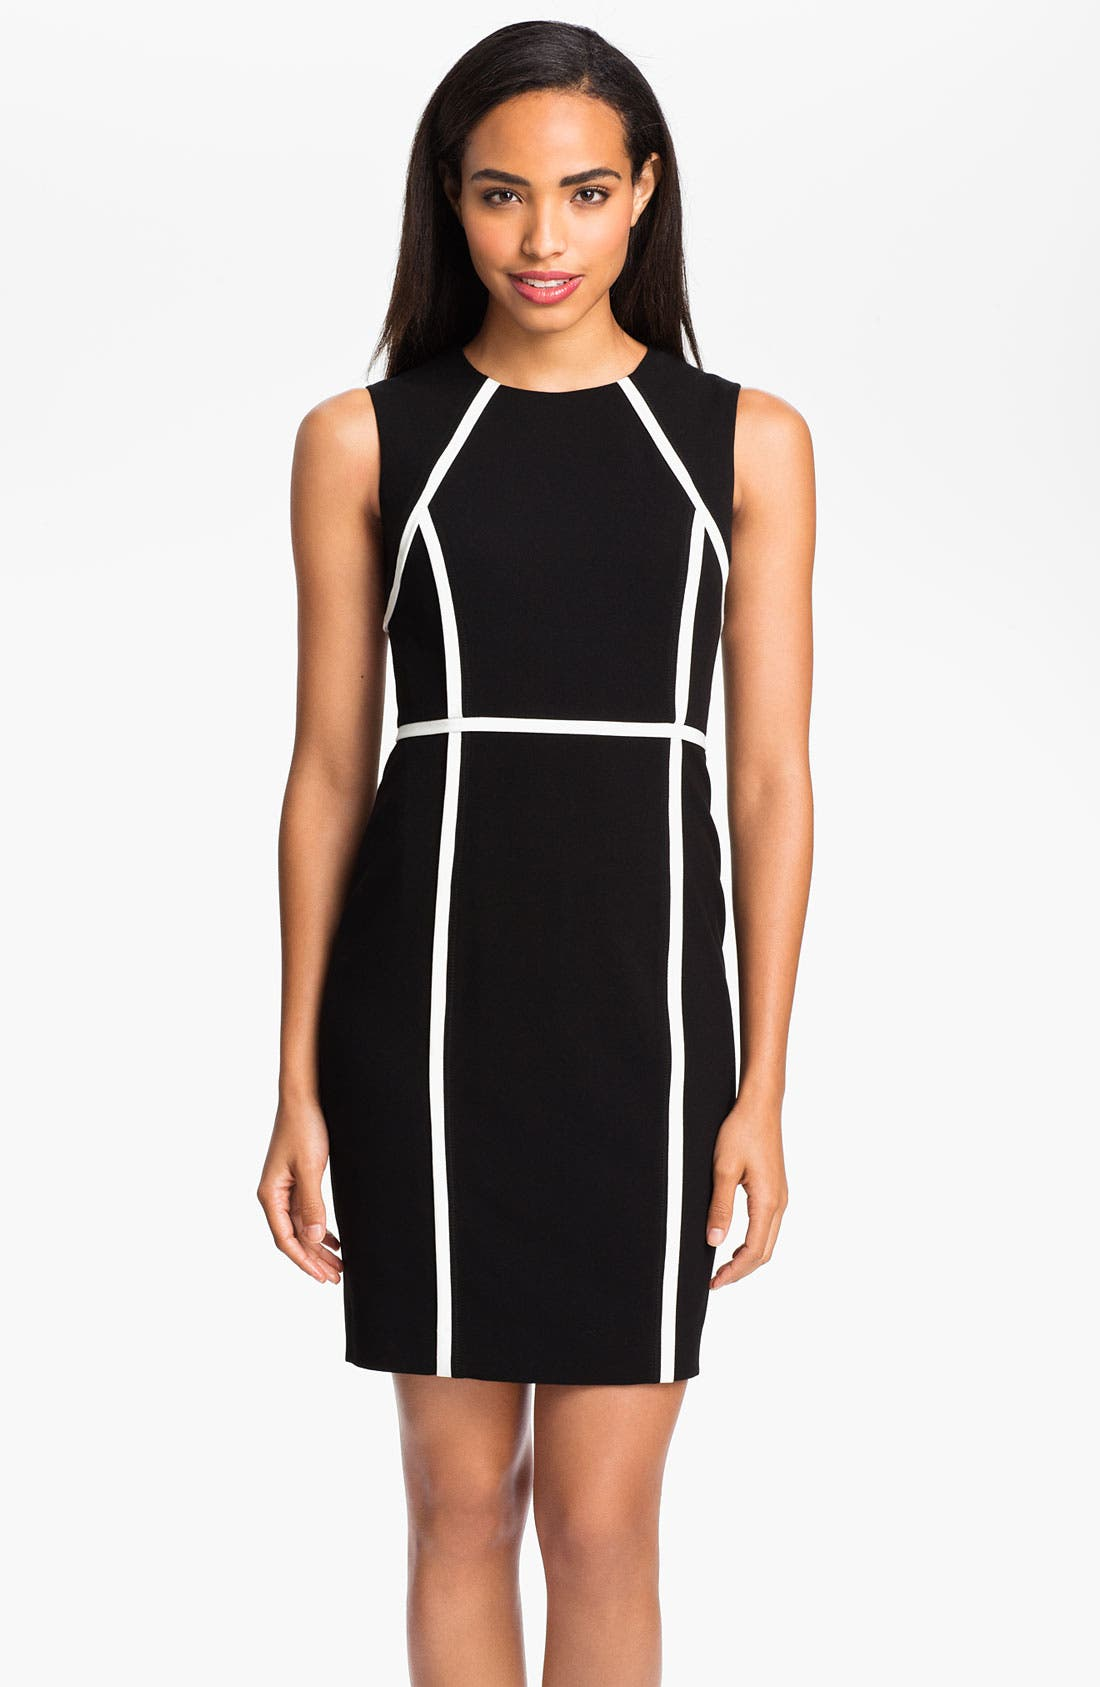 Alternate Image 1 Selected - Calvin Klein Contrast Trim Sheath Dress